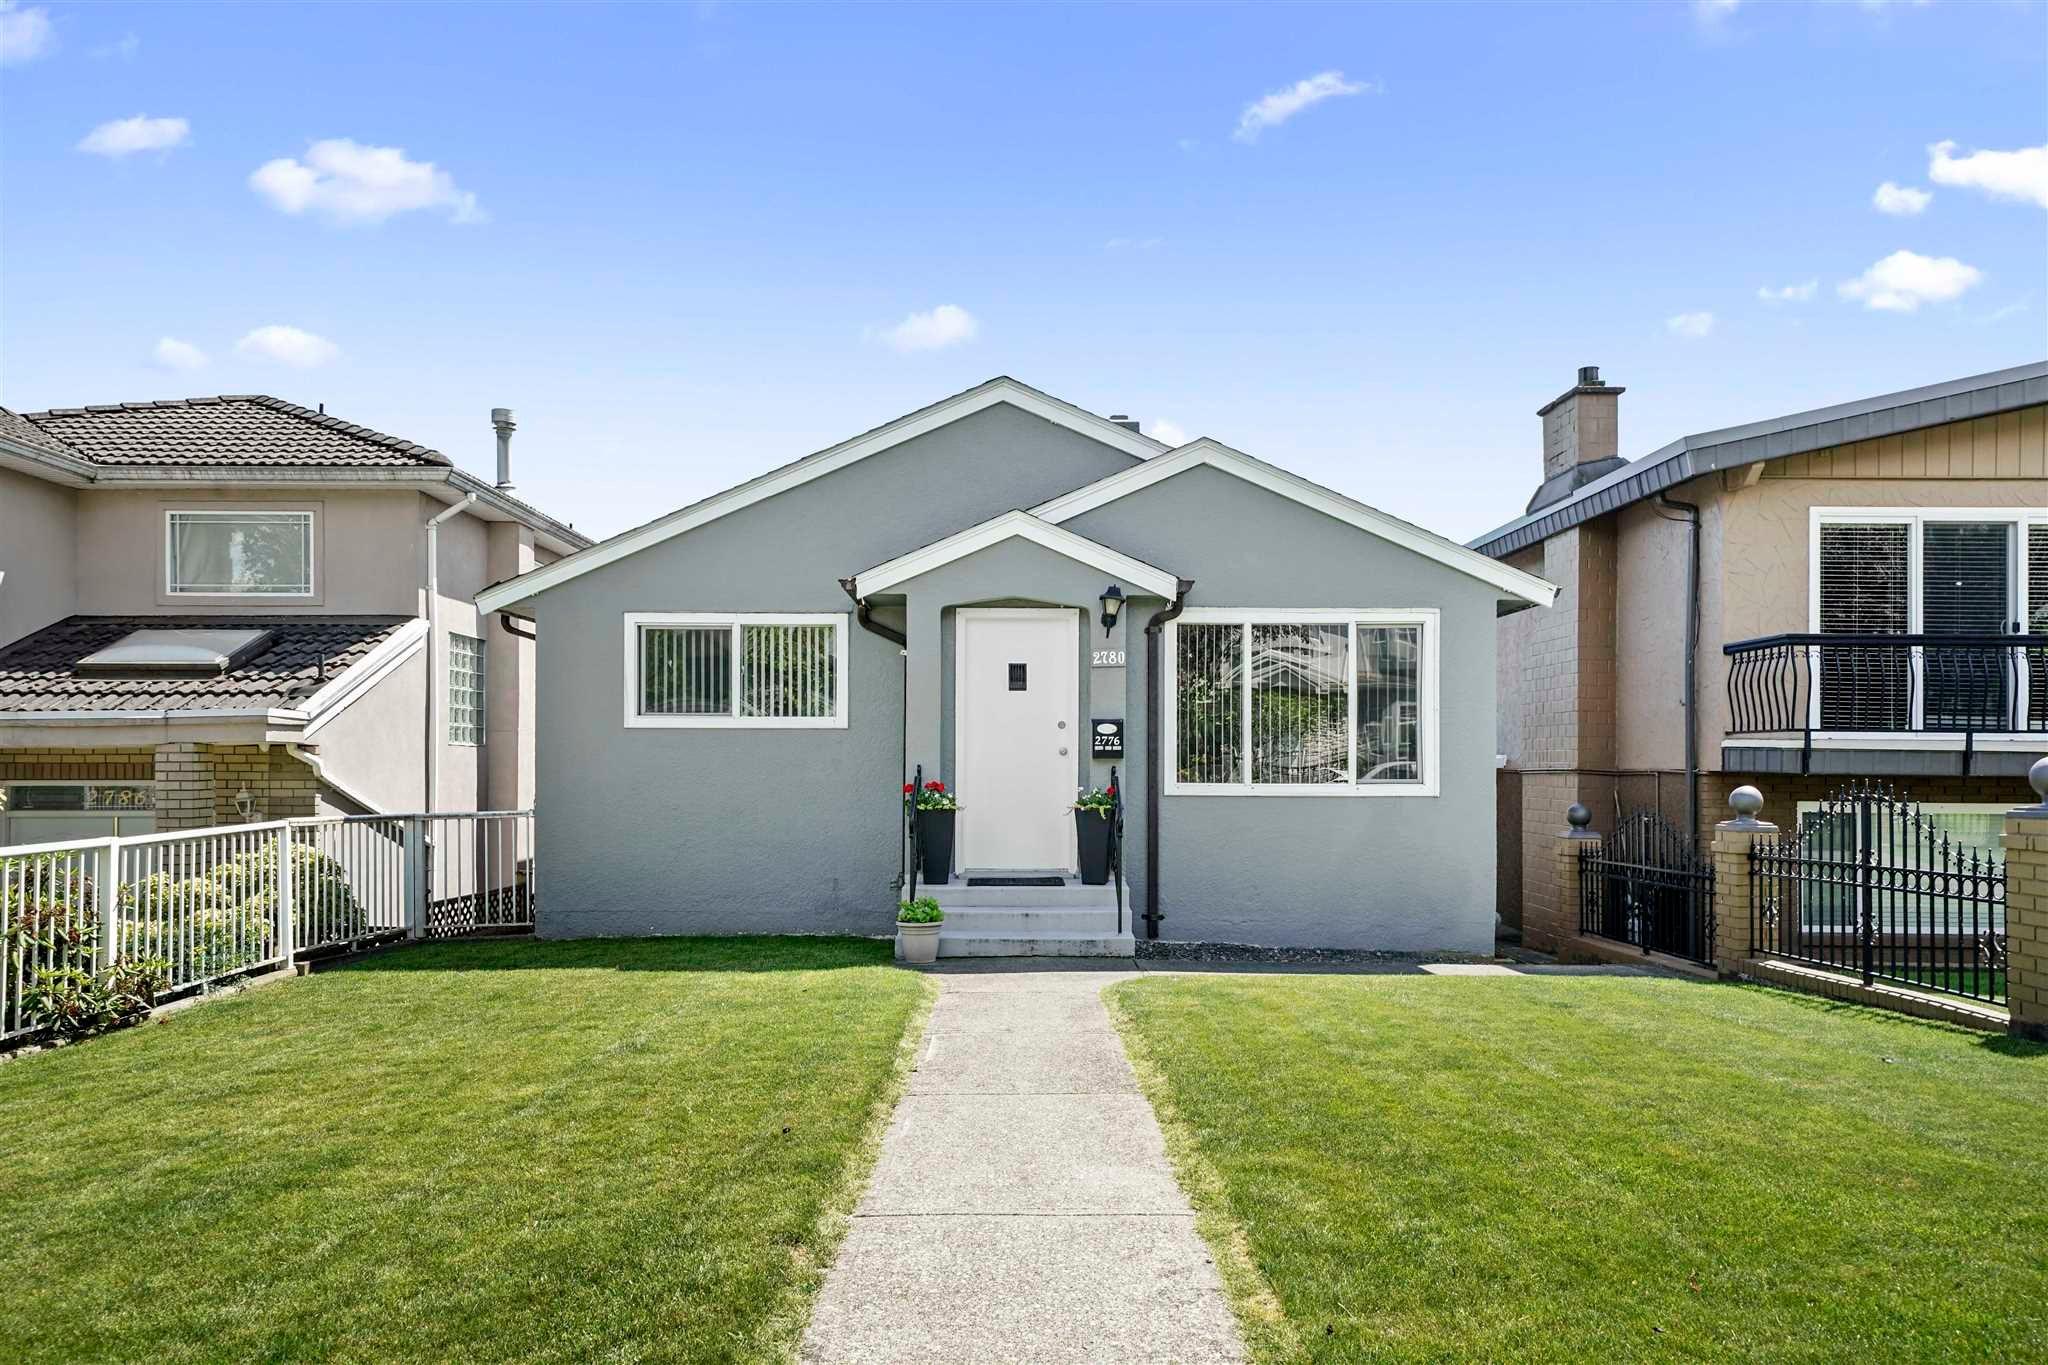 2780 E 7TH AVENUE - Renfrew VE House/Single Family for sale, 5 Bedrooms (R2604109) - #1